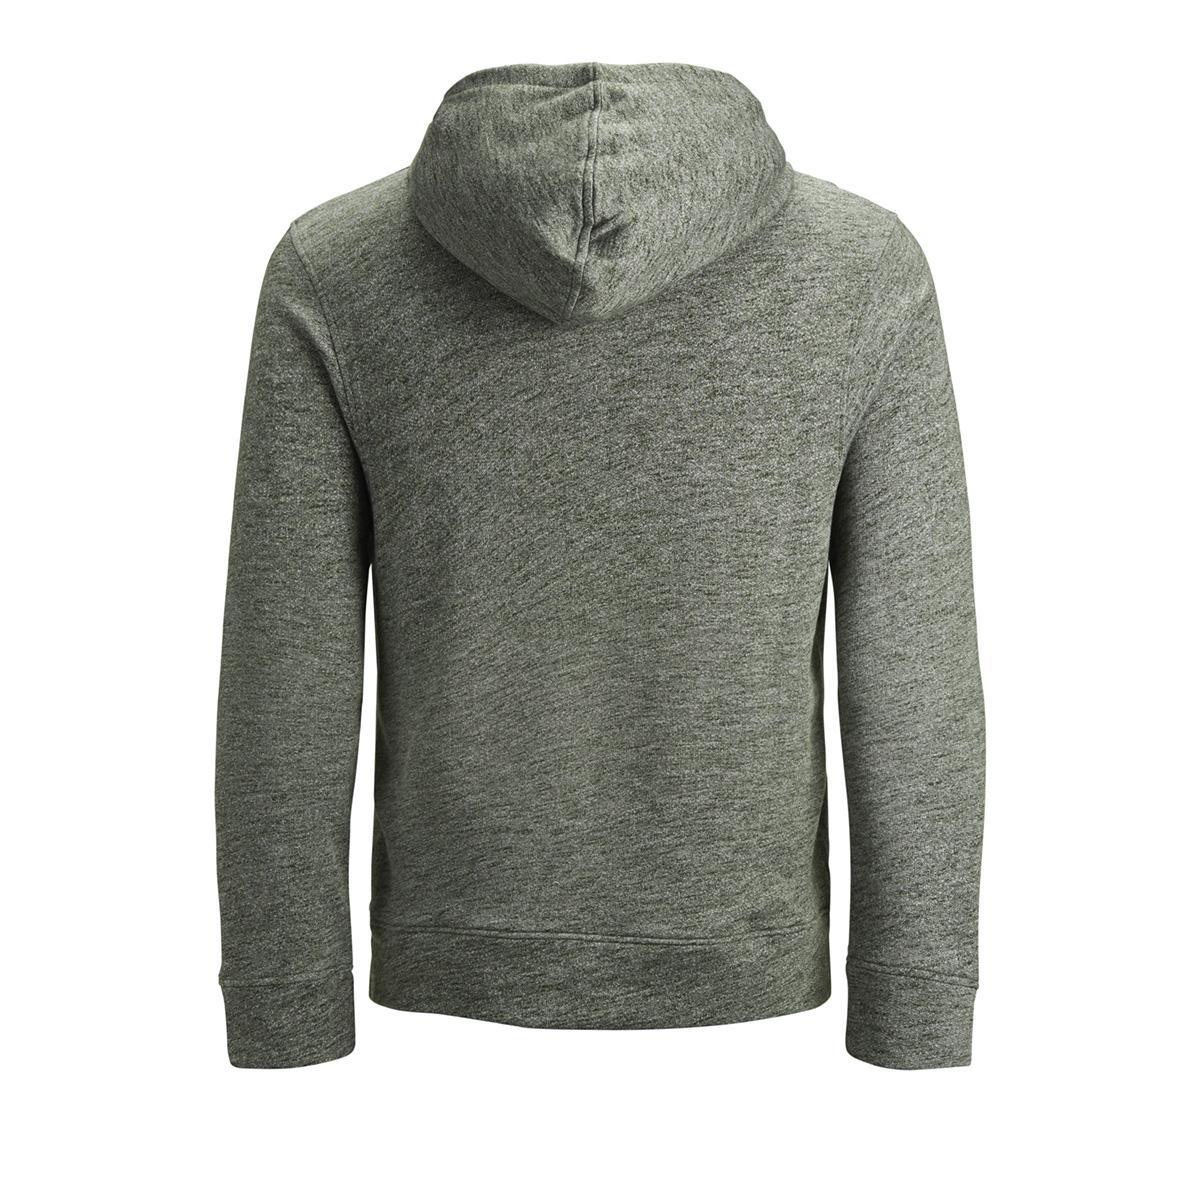 jjepanther sweat hood noos 12141011 jack & jones sweater olive night/reg fit